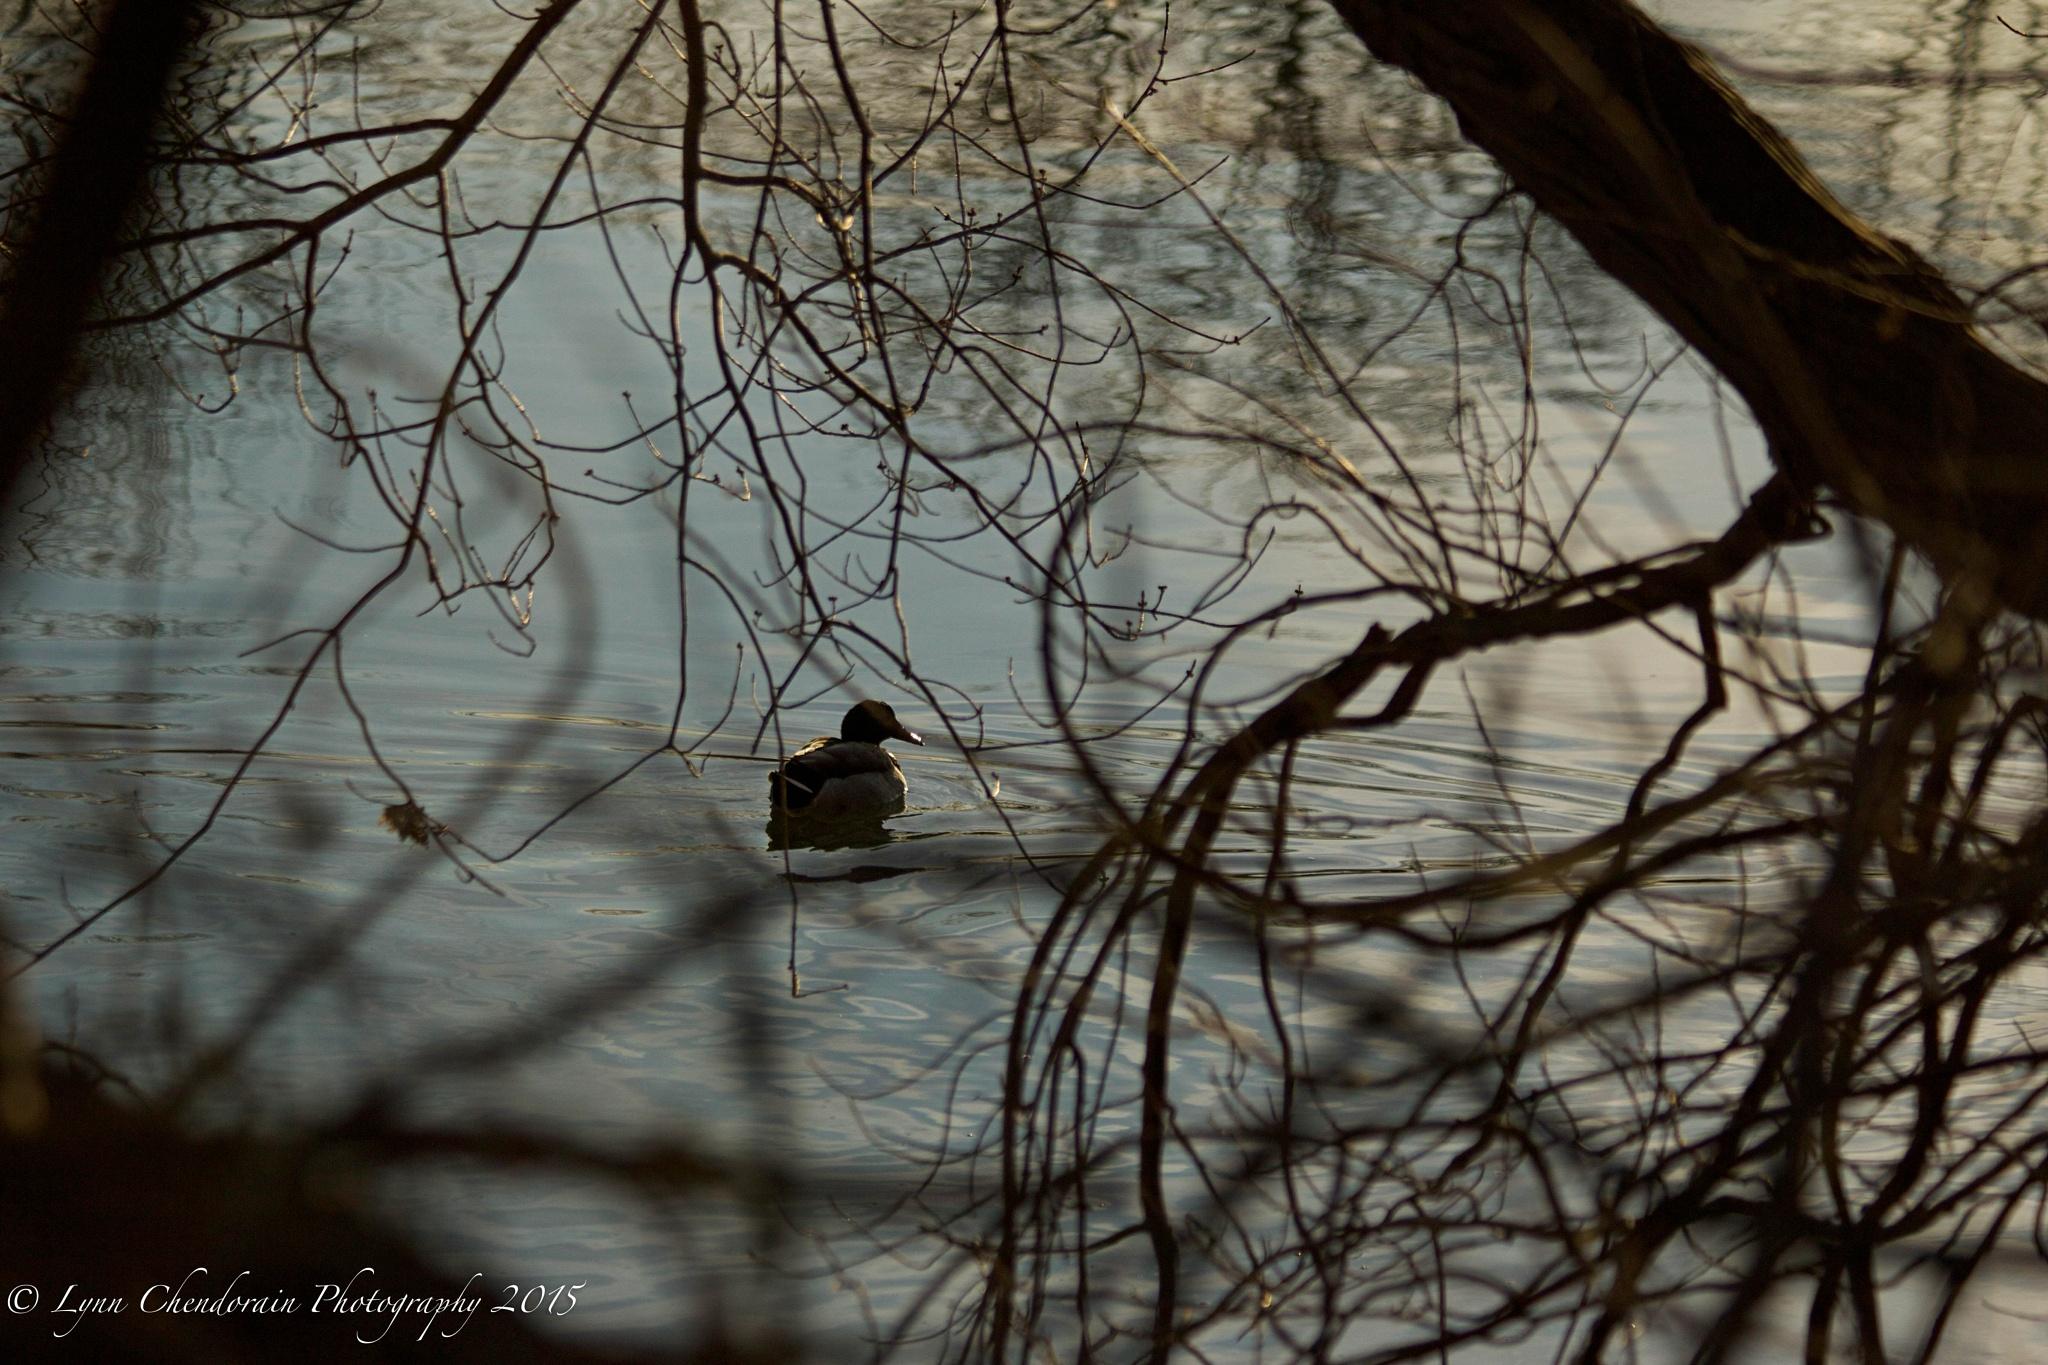 On the River by Lynn Chendorain